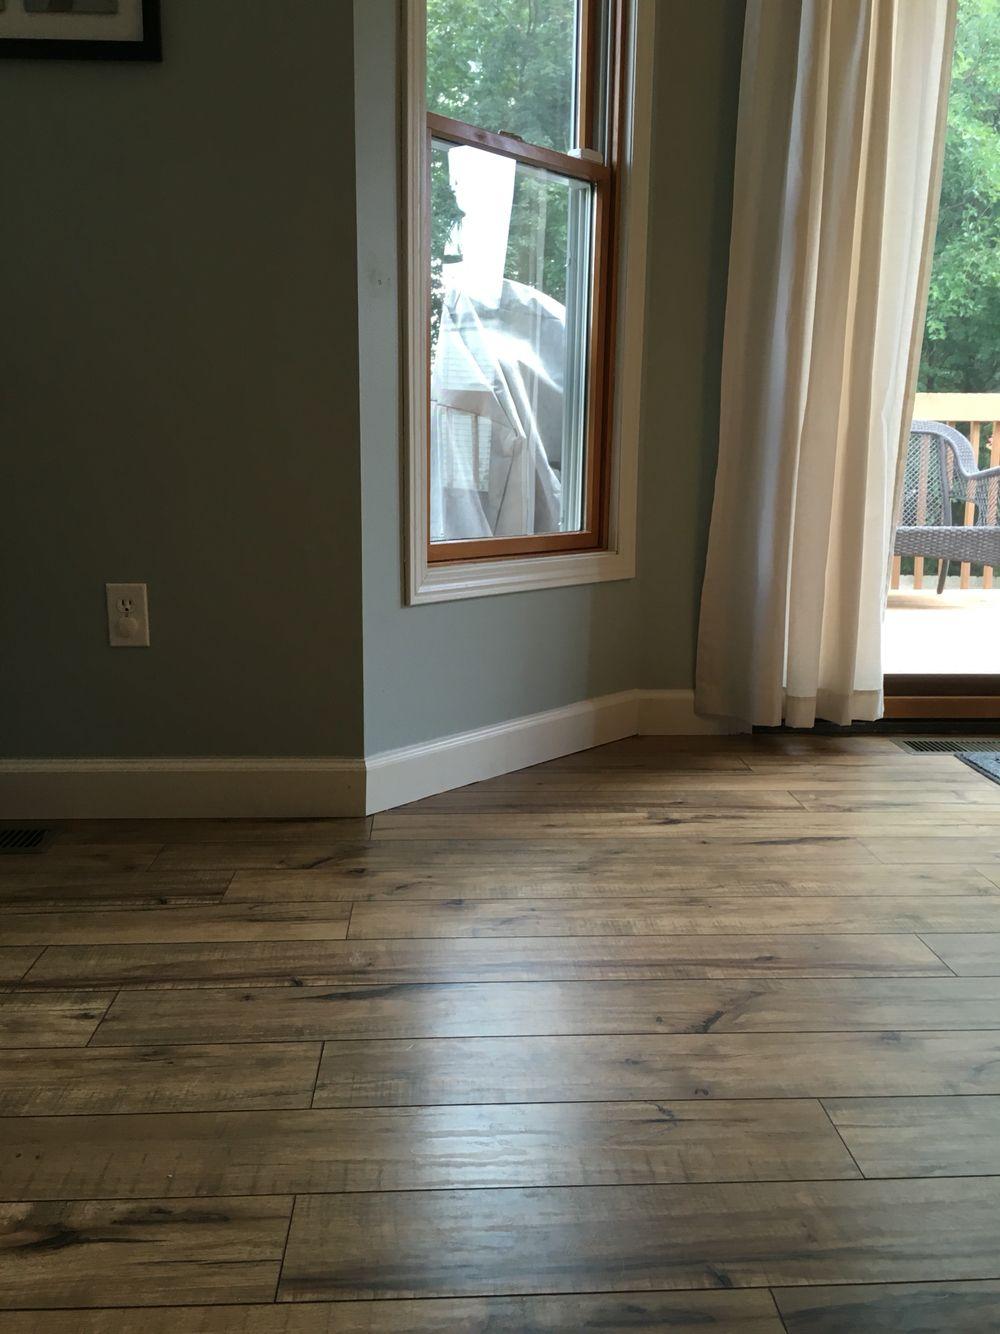 Shaw Laminate Floor 12mm Lumberjack Hickory Flooring Laminate Flooring Vinyl Laminate Flooring